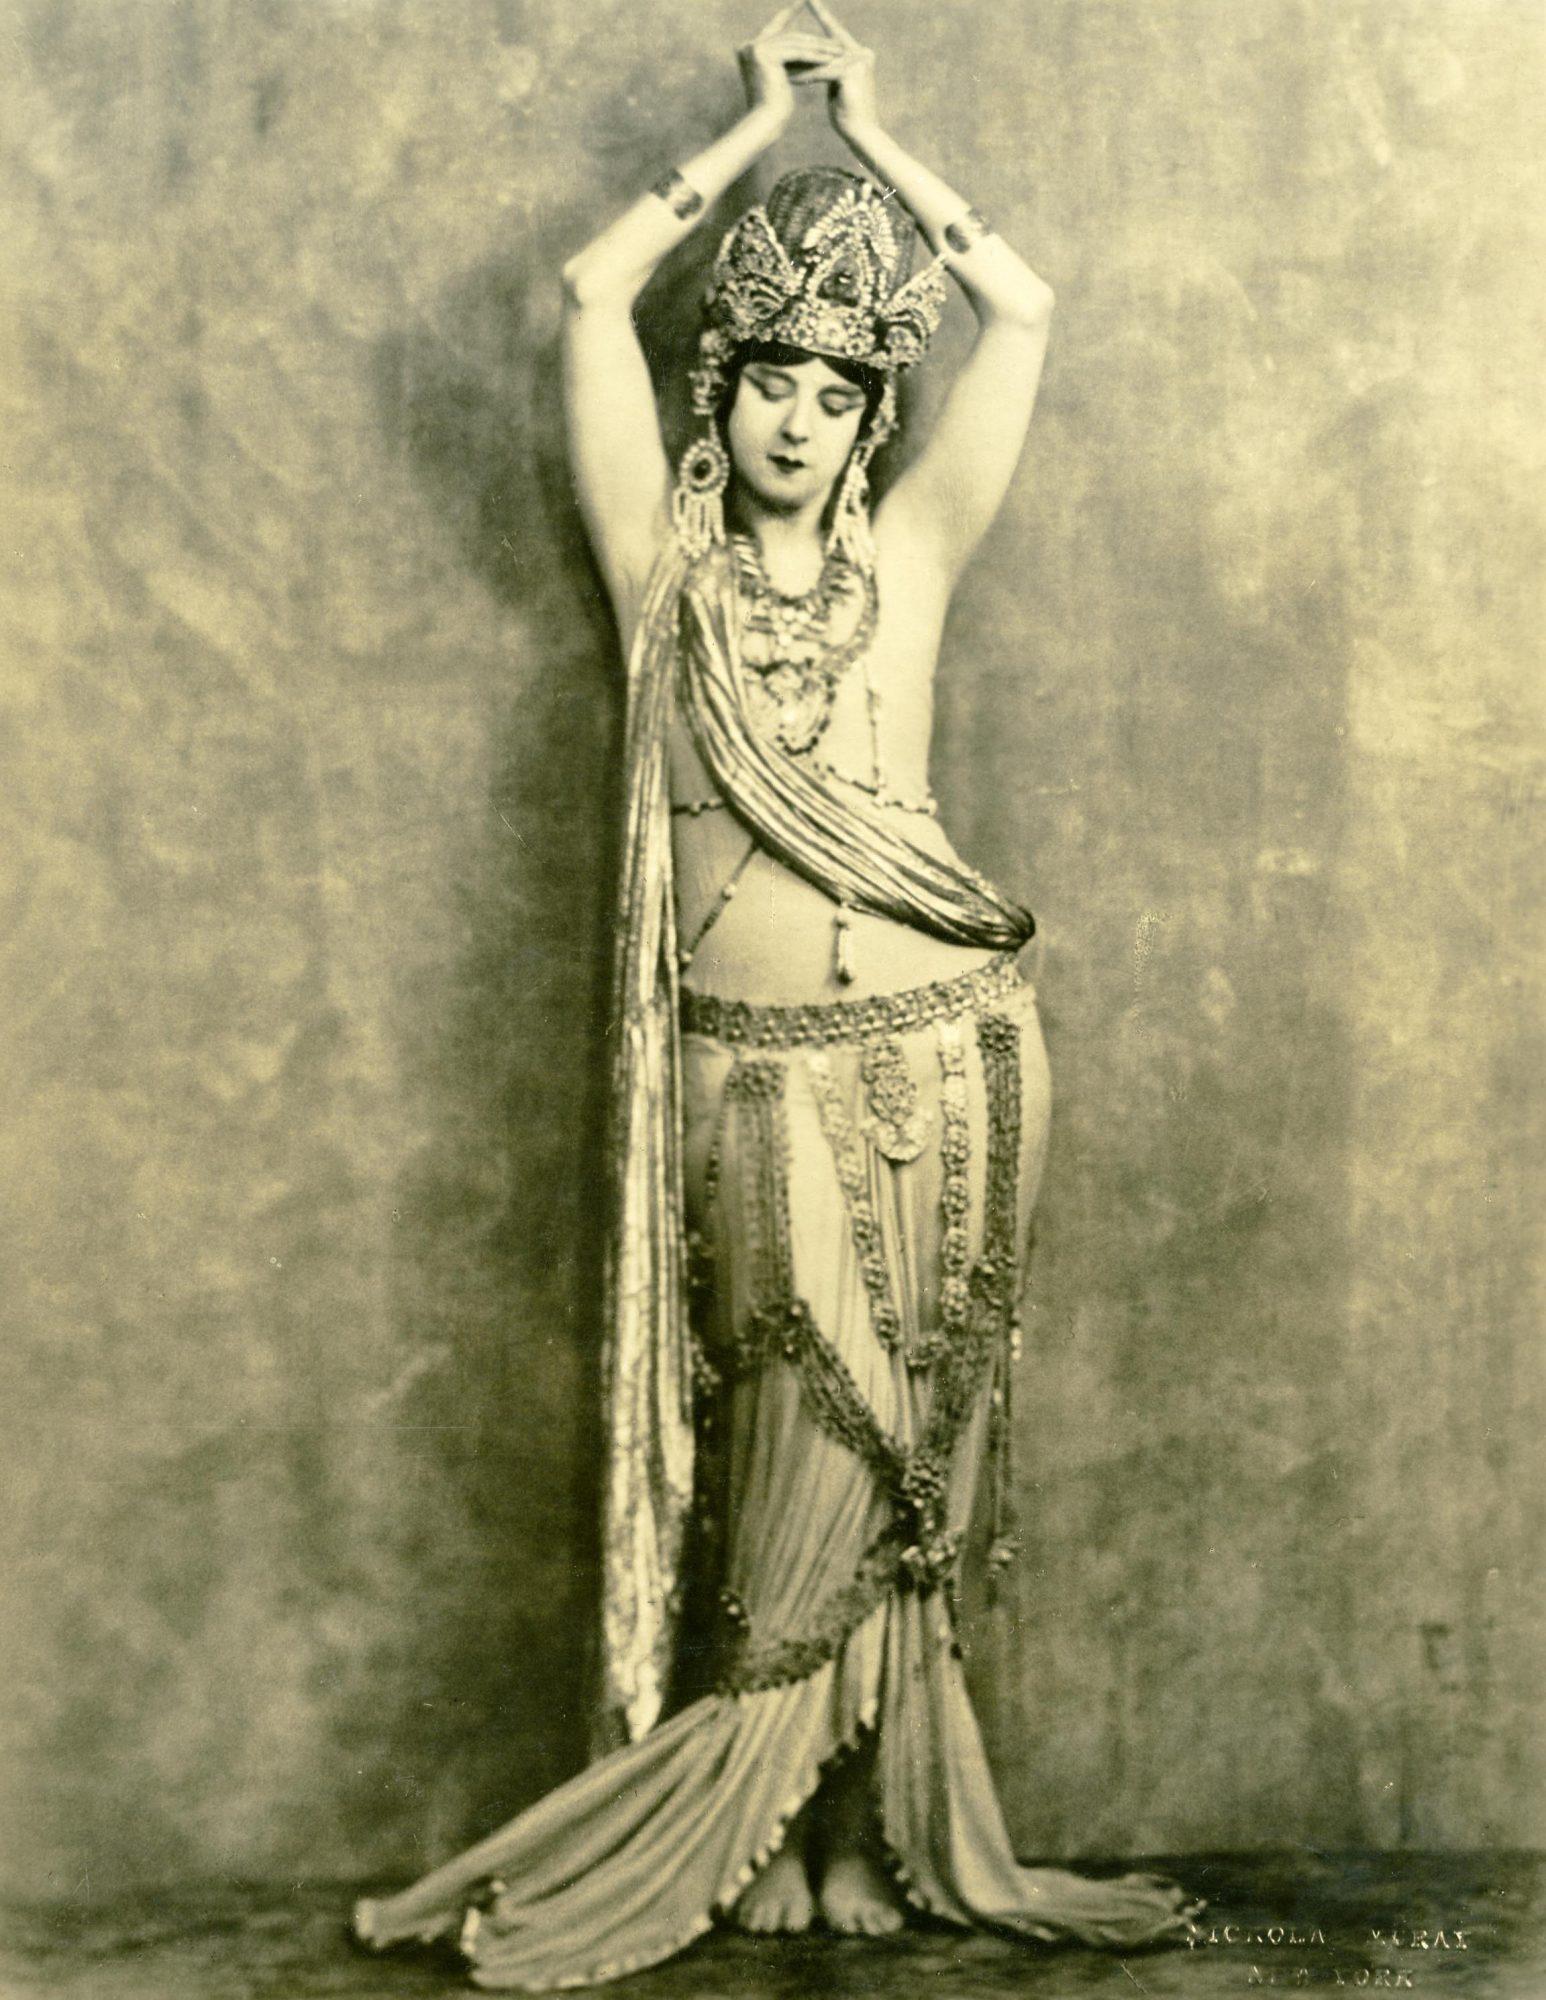 Nickolas Muray, Ruth St. Denis in Kuan Yin, ca. 1919. Courtesy of Jacob's Pillow Dance Festival Archives.